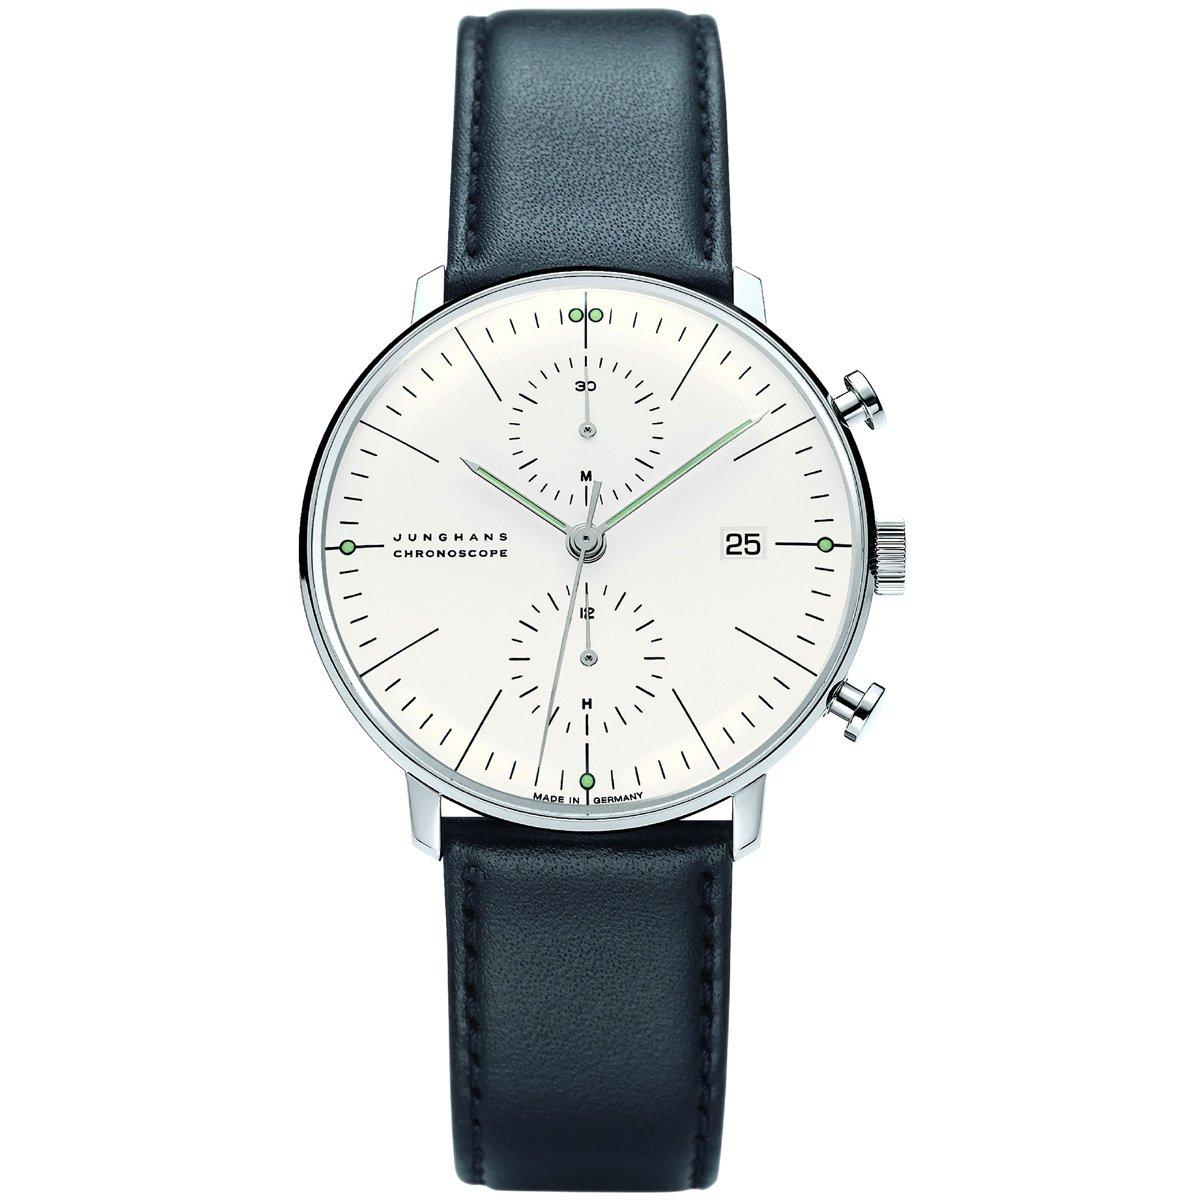 Junghans MAX BILL CHRONOSCOPE Automatic Chronograph 027/4600.00